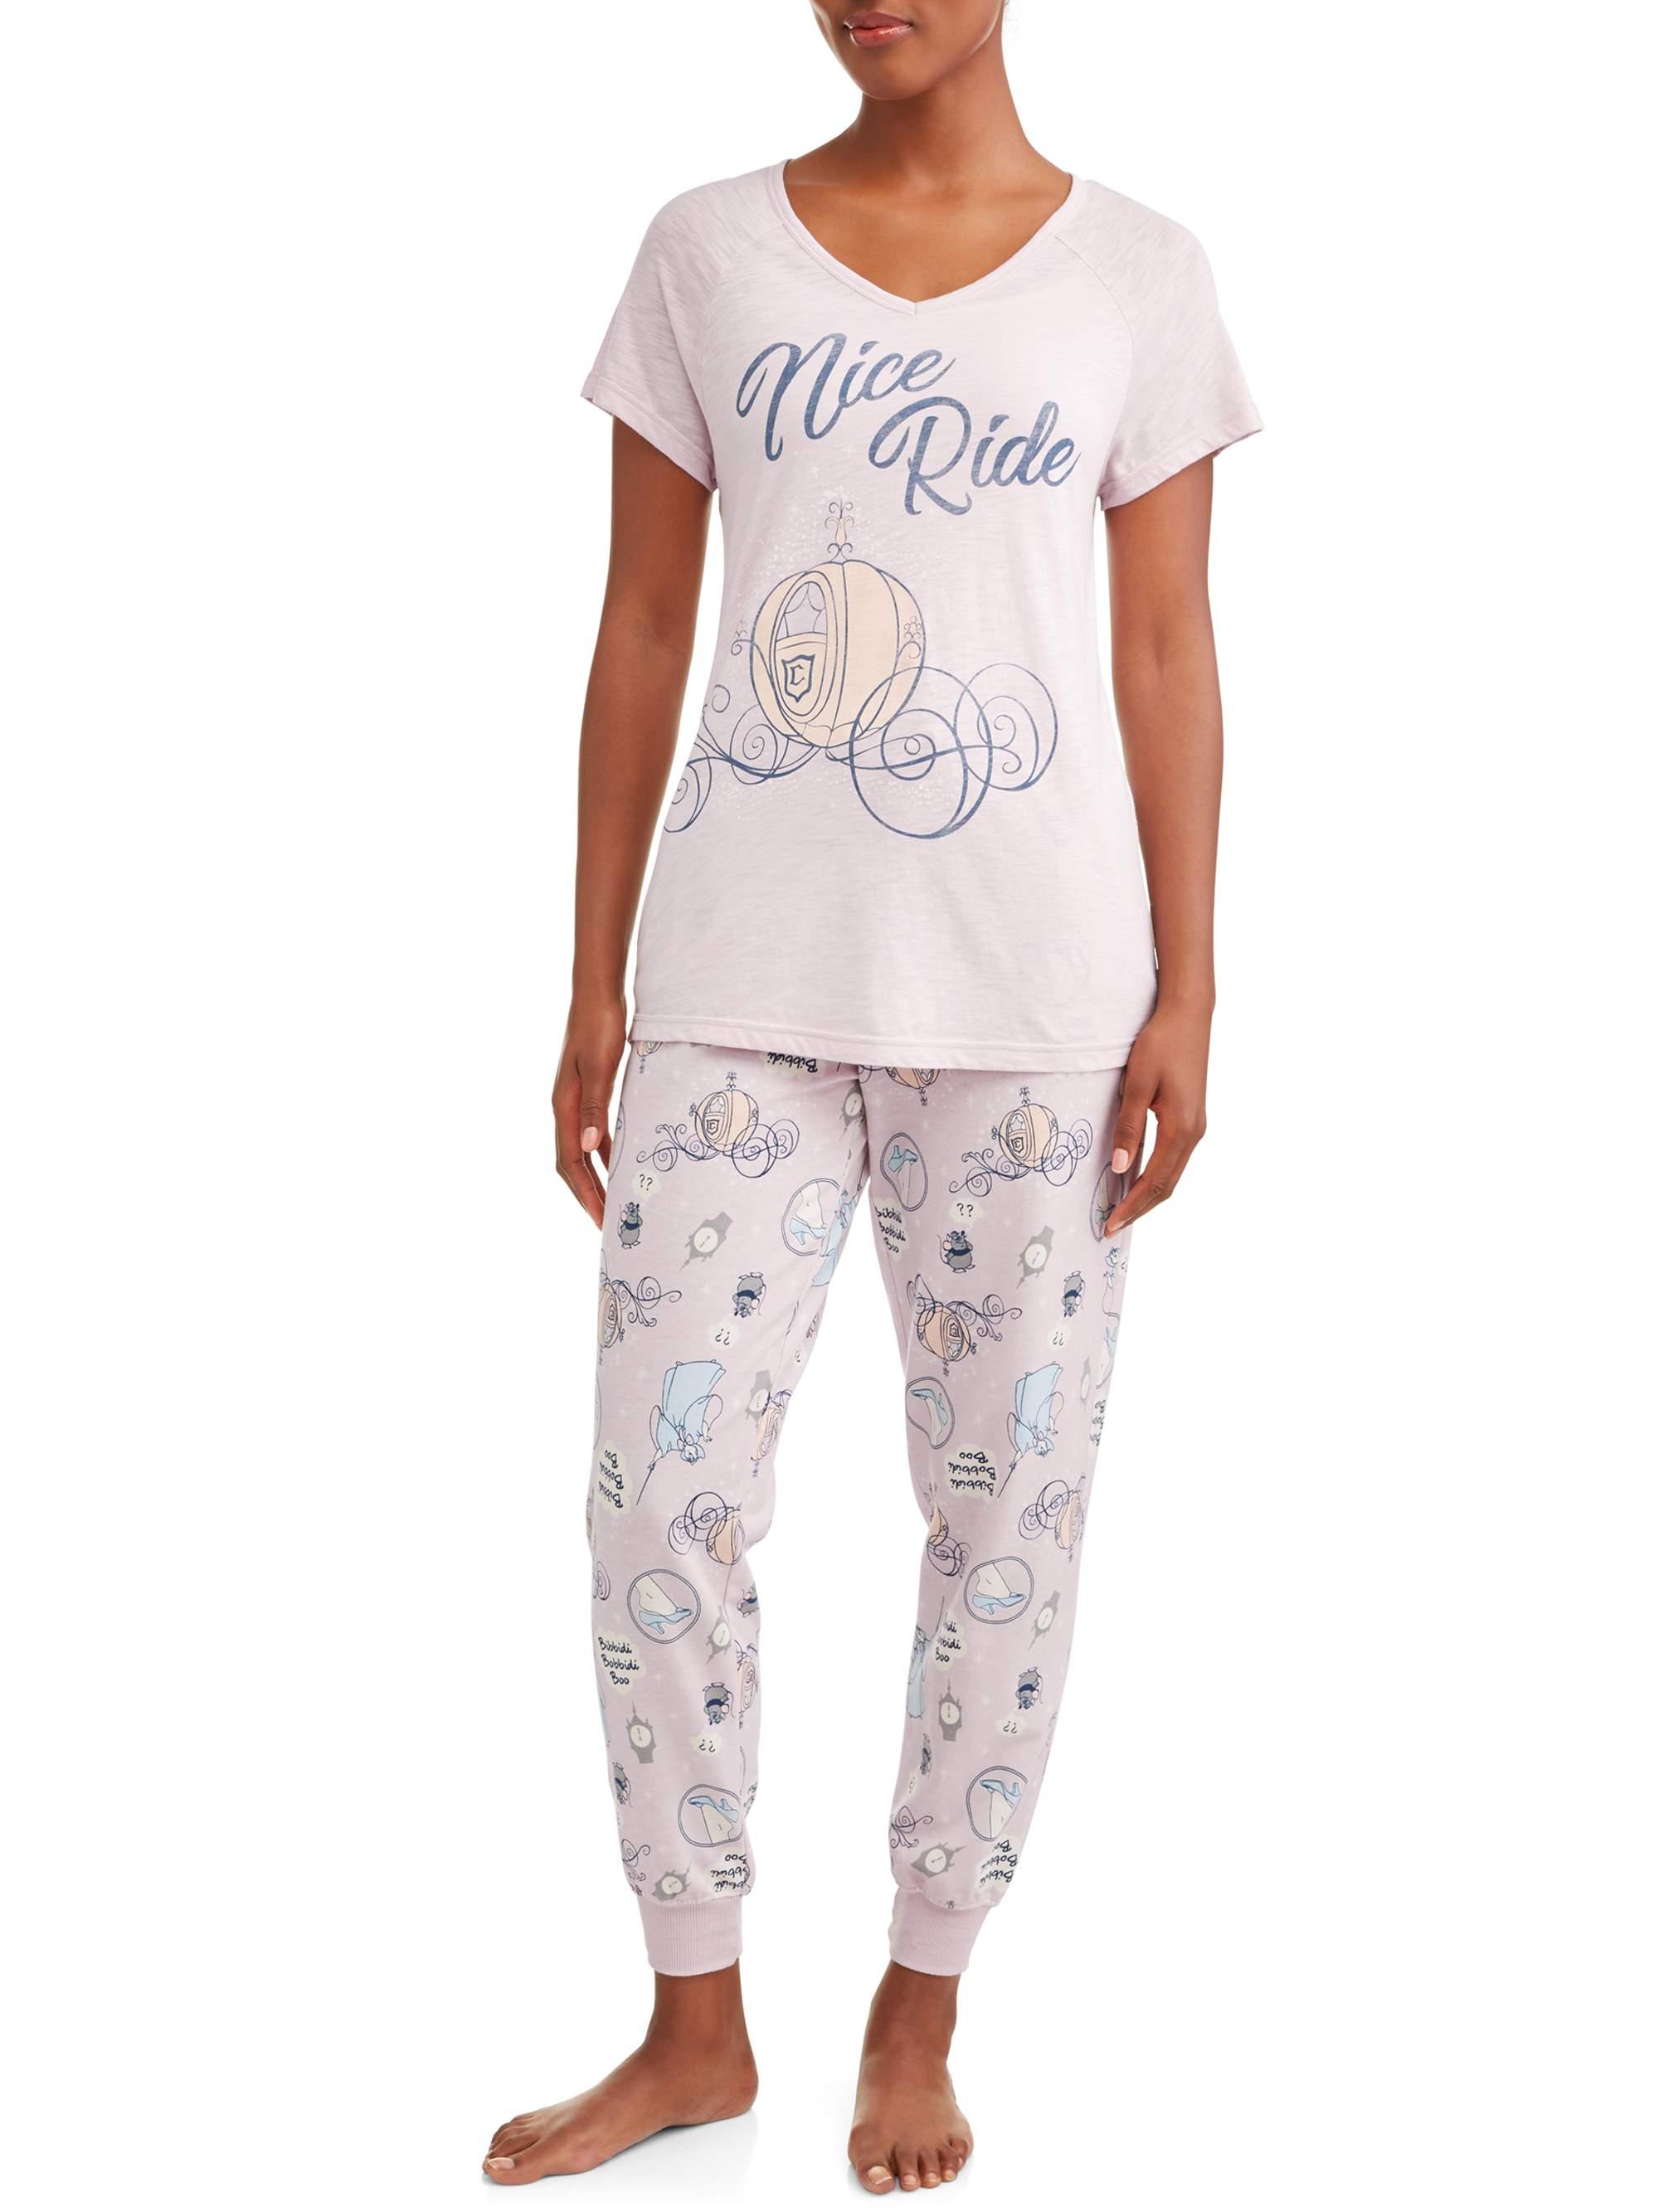 Women's and Women's Plus Cinderella T-shirt Pajama Pant Set